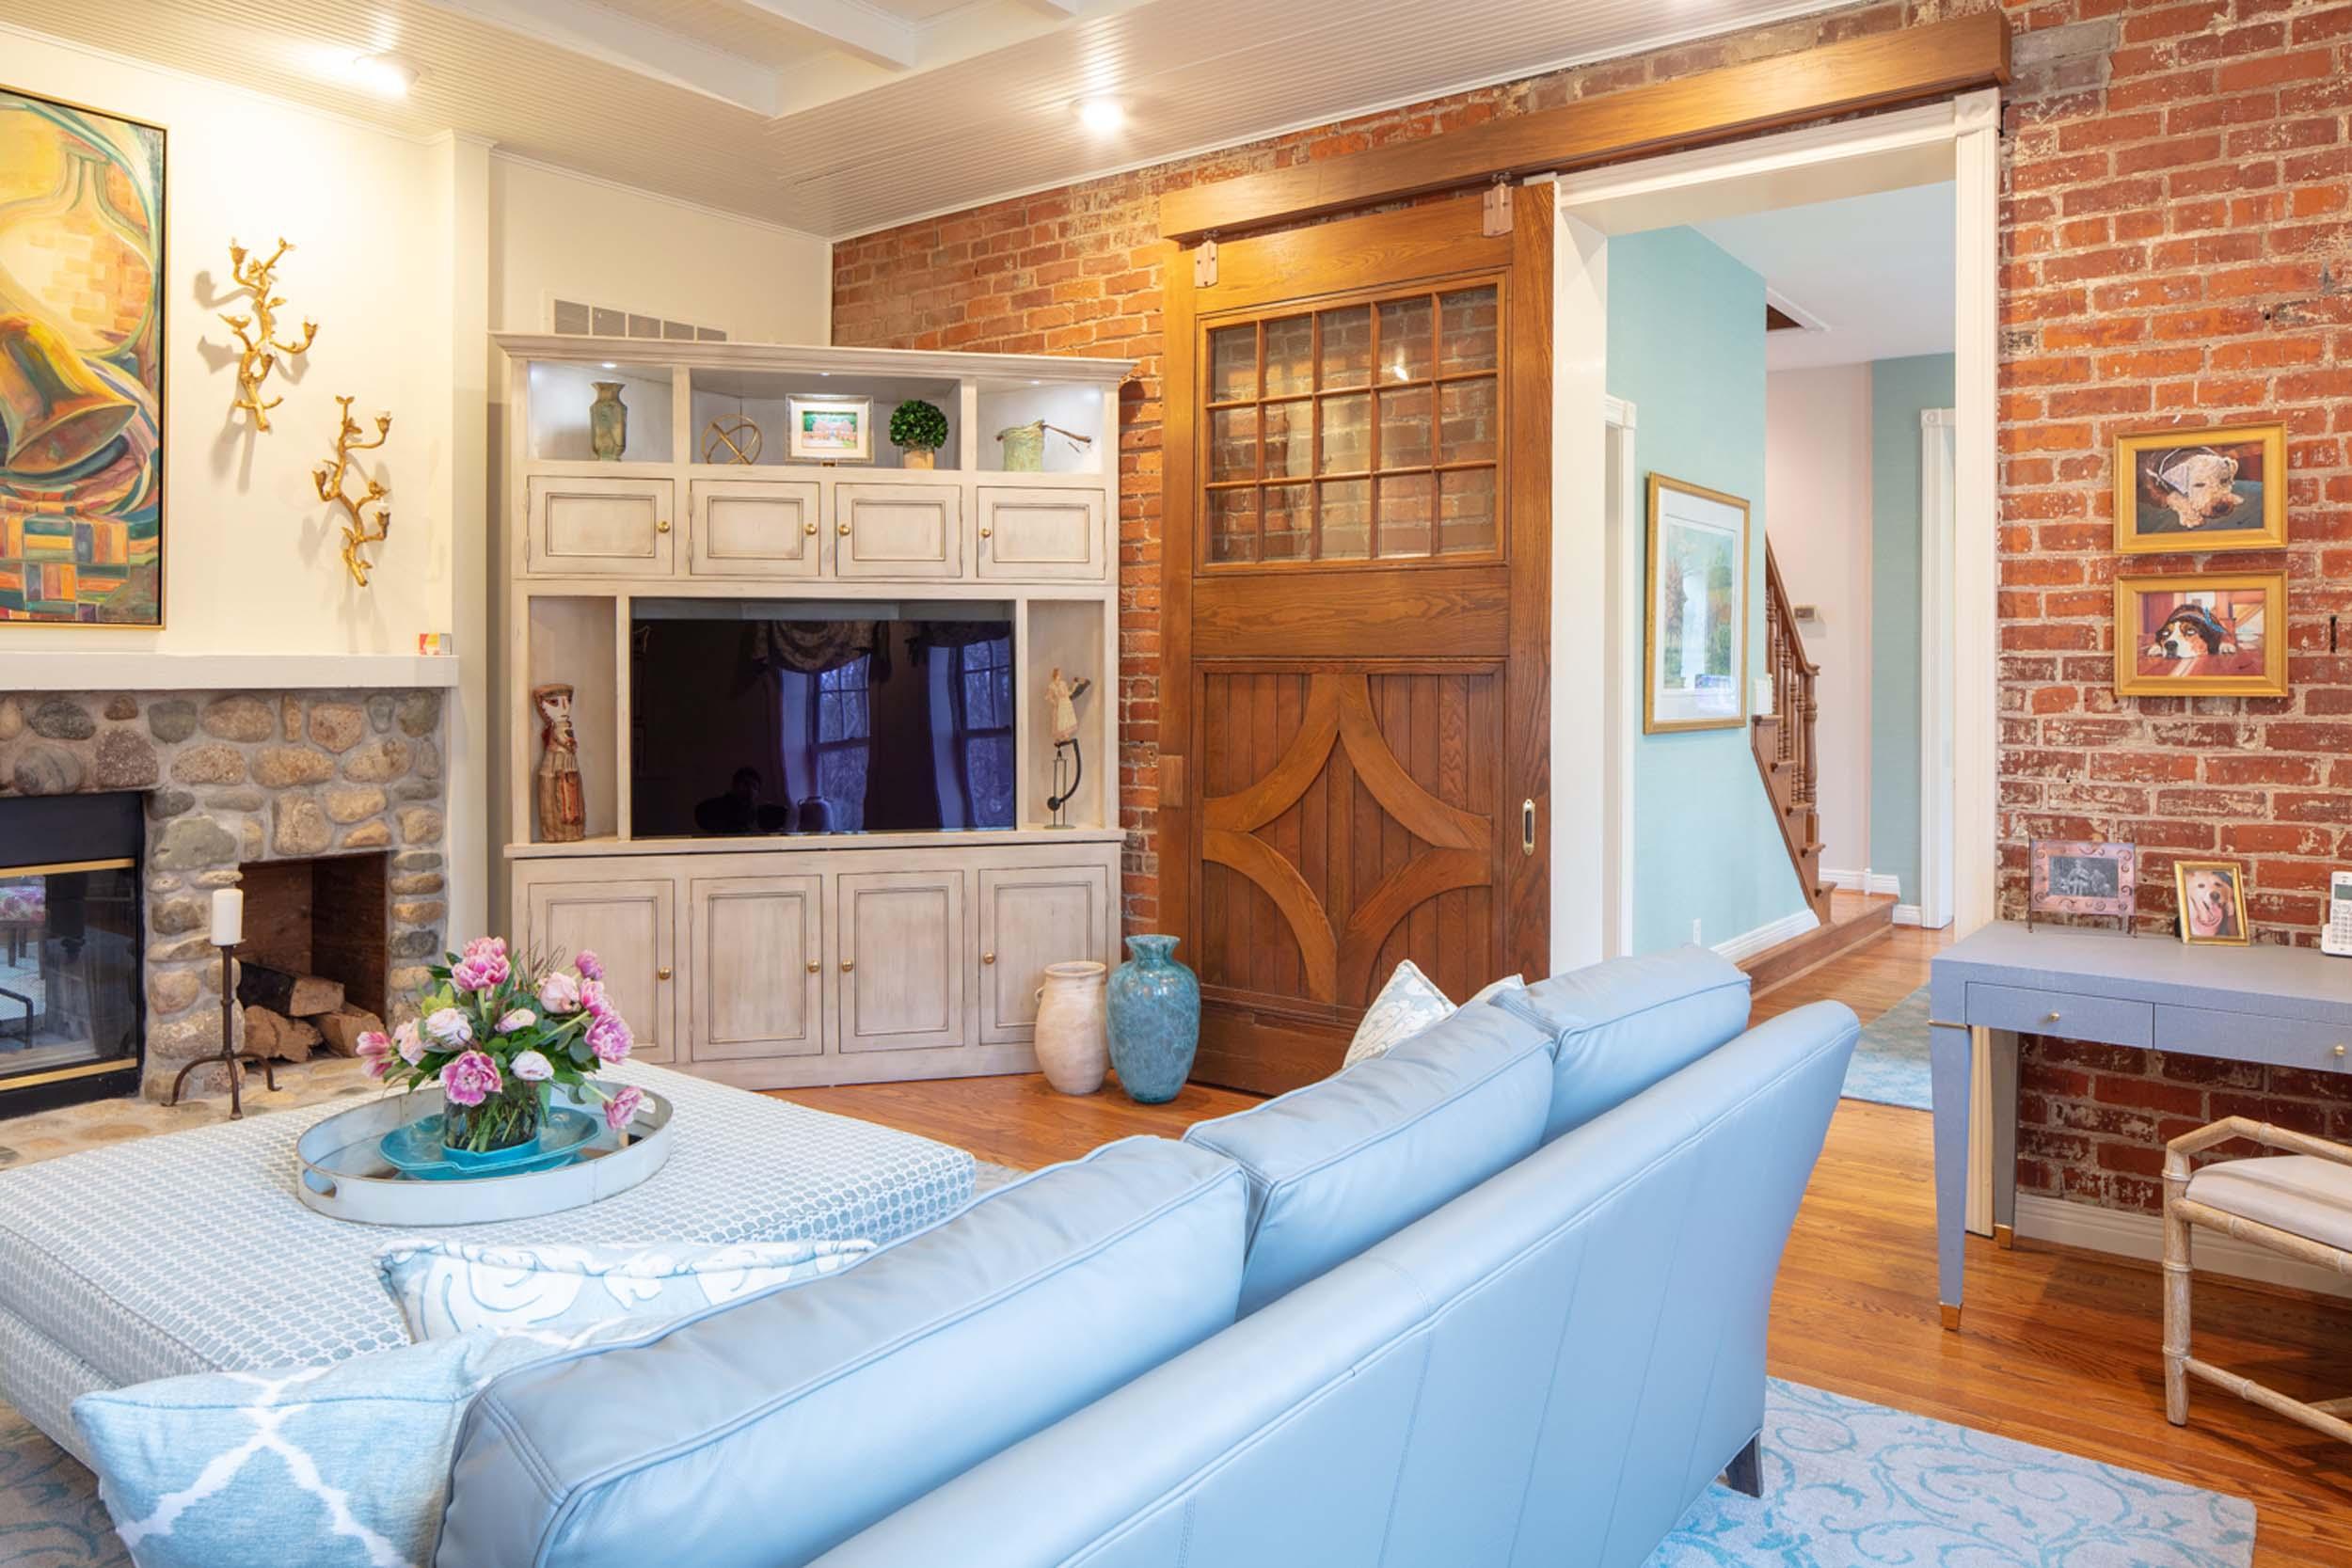 Modern living room with blue sofa and ottoman